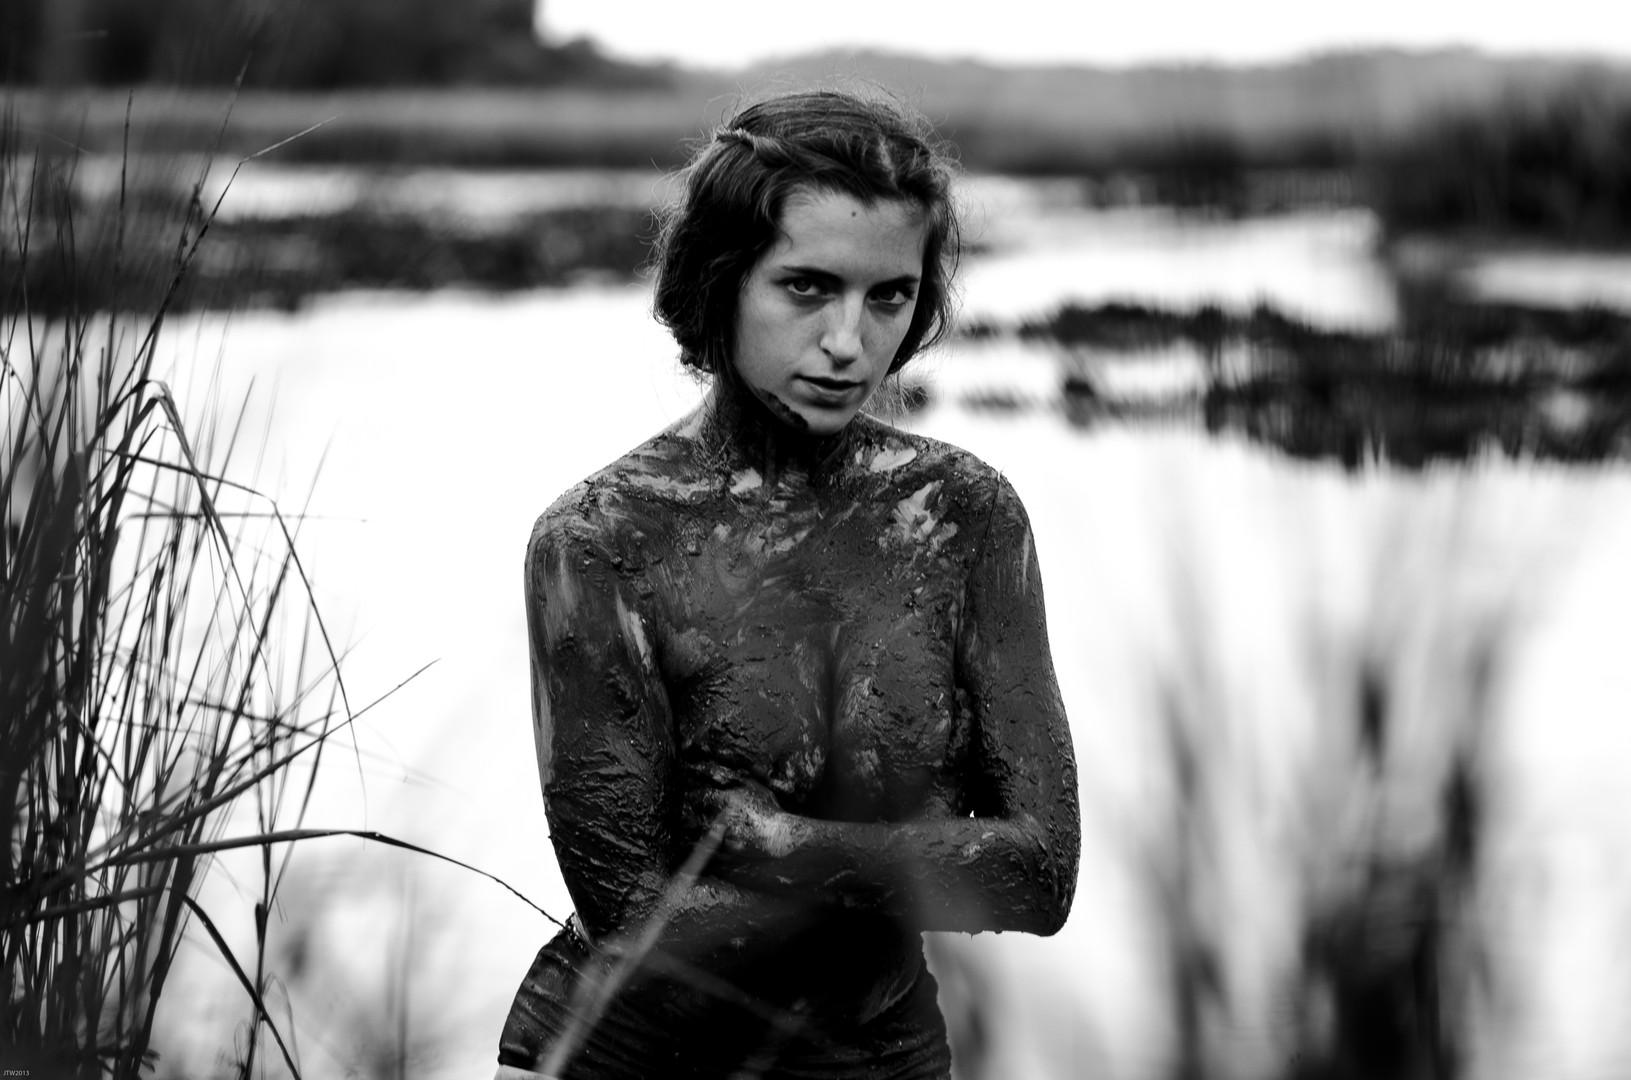 Caroline in Mud, 2015